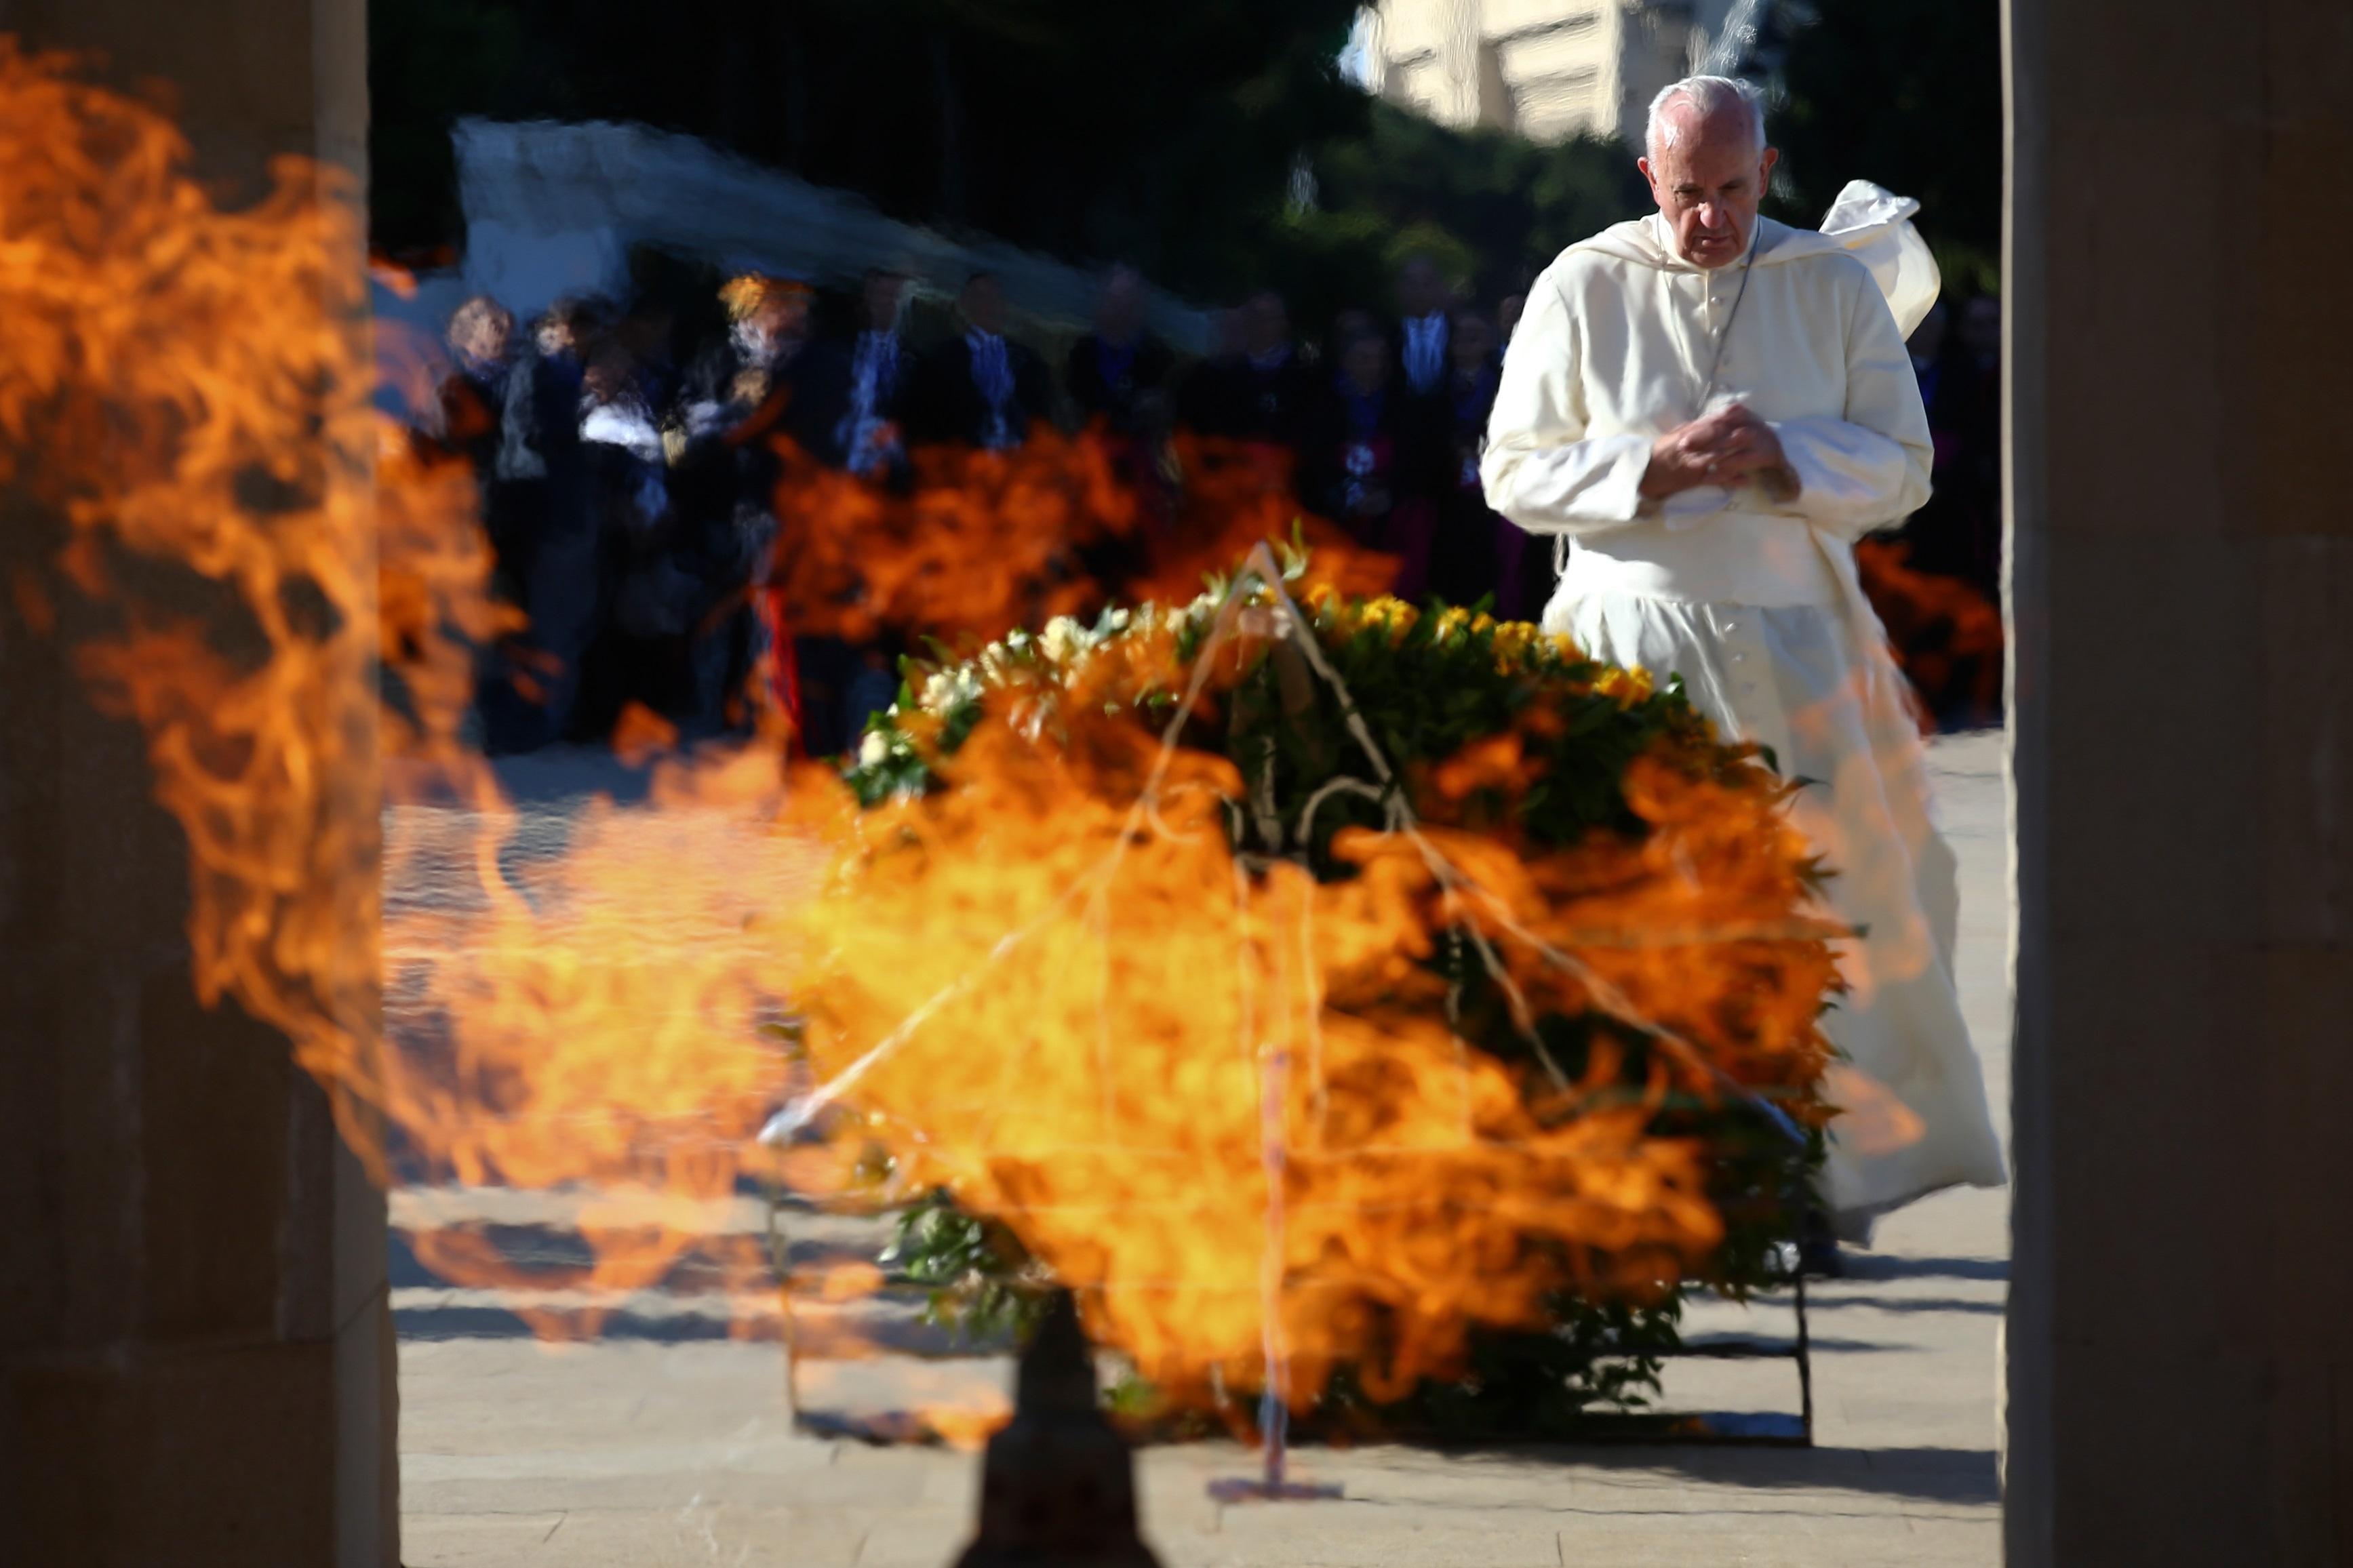 Pope Francis prays at the Azerbaijan Baku City Shadhidlar Hiyabani Monument to the Fallen Heroes on October 2, 2016 in Baku.  Pope Francis on October 2 arrived in mainly Muslim Azerbaijan on the last leg of his peace tour of the volatile ex-Soviet Caucasus region, just months after visiting neighbouring Armenia.